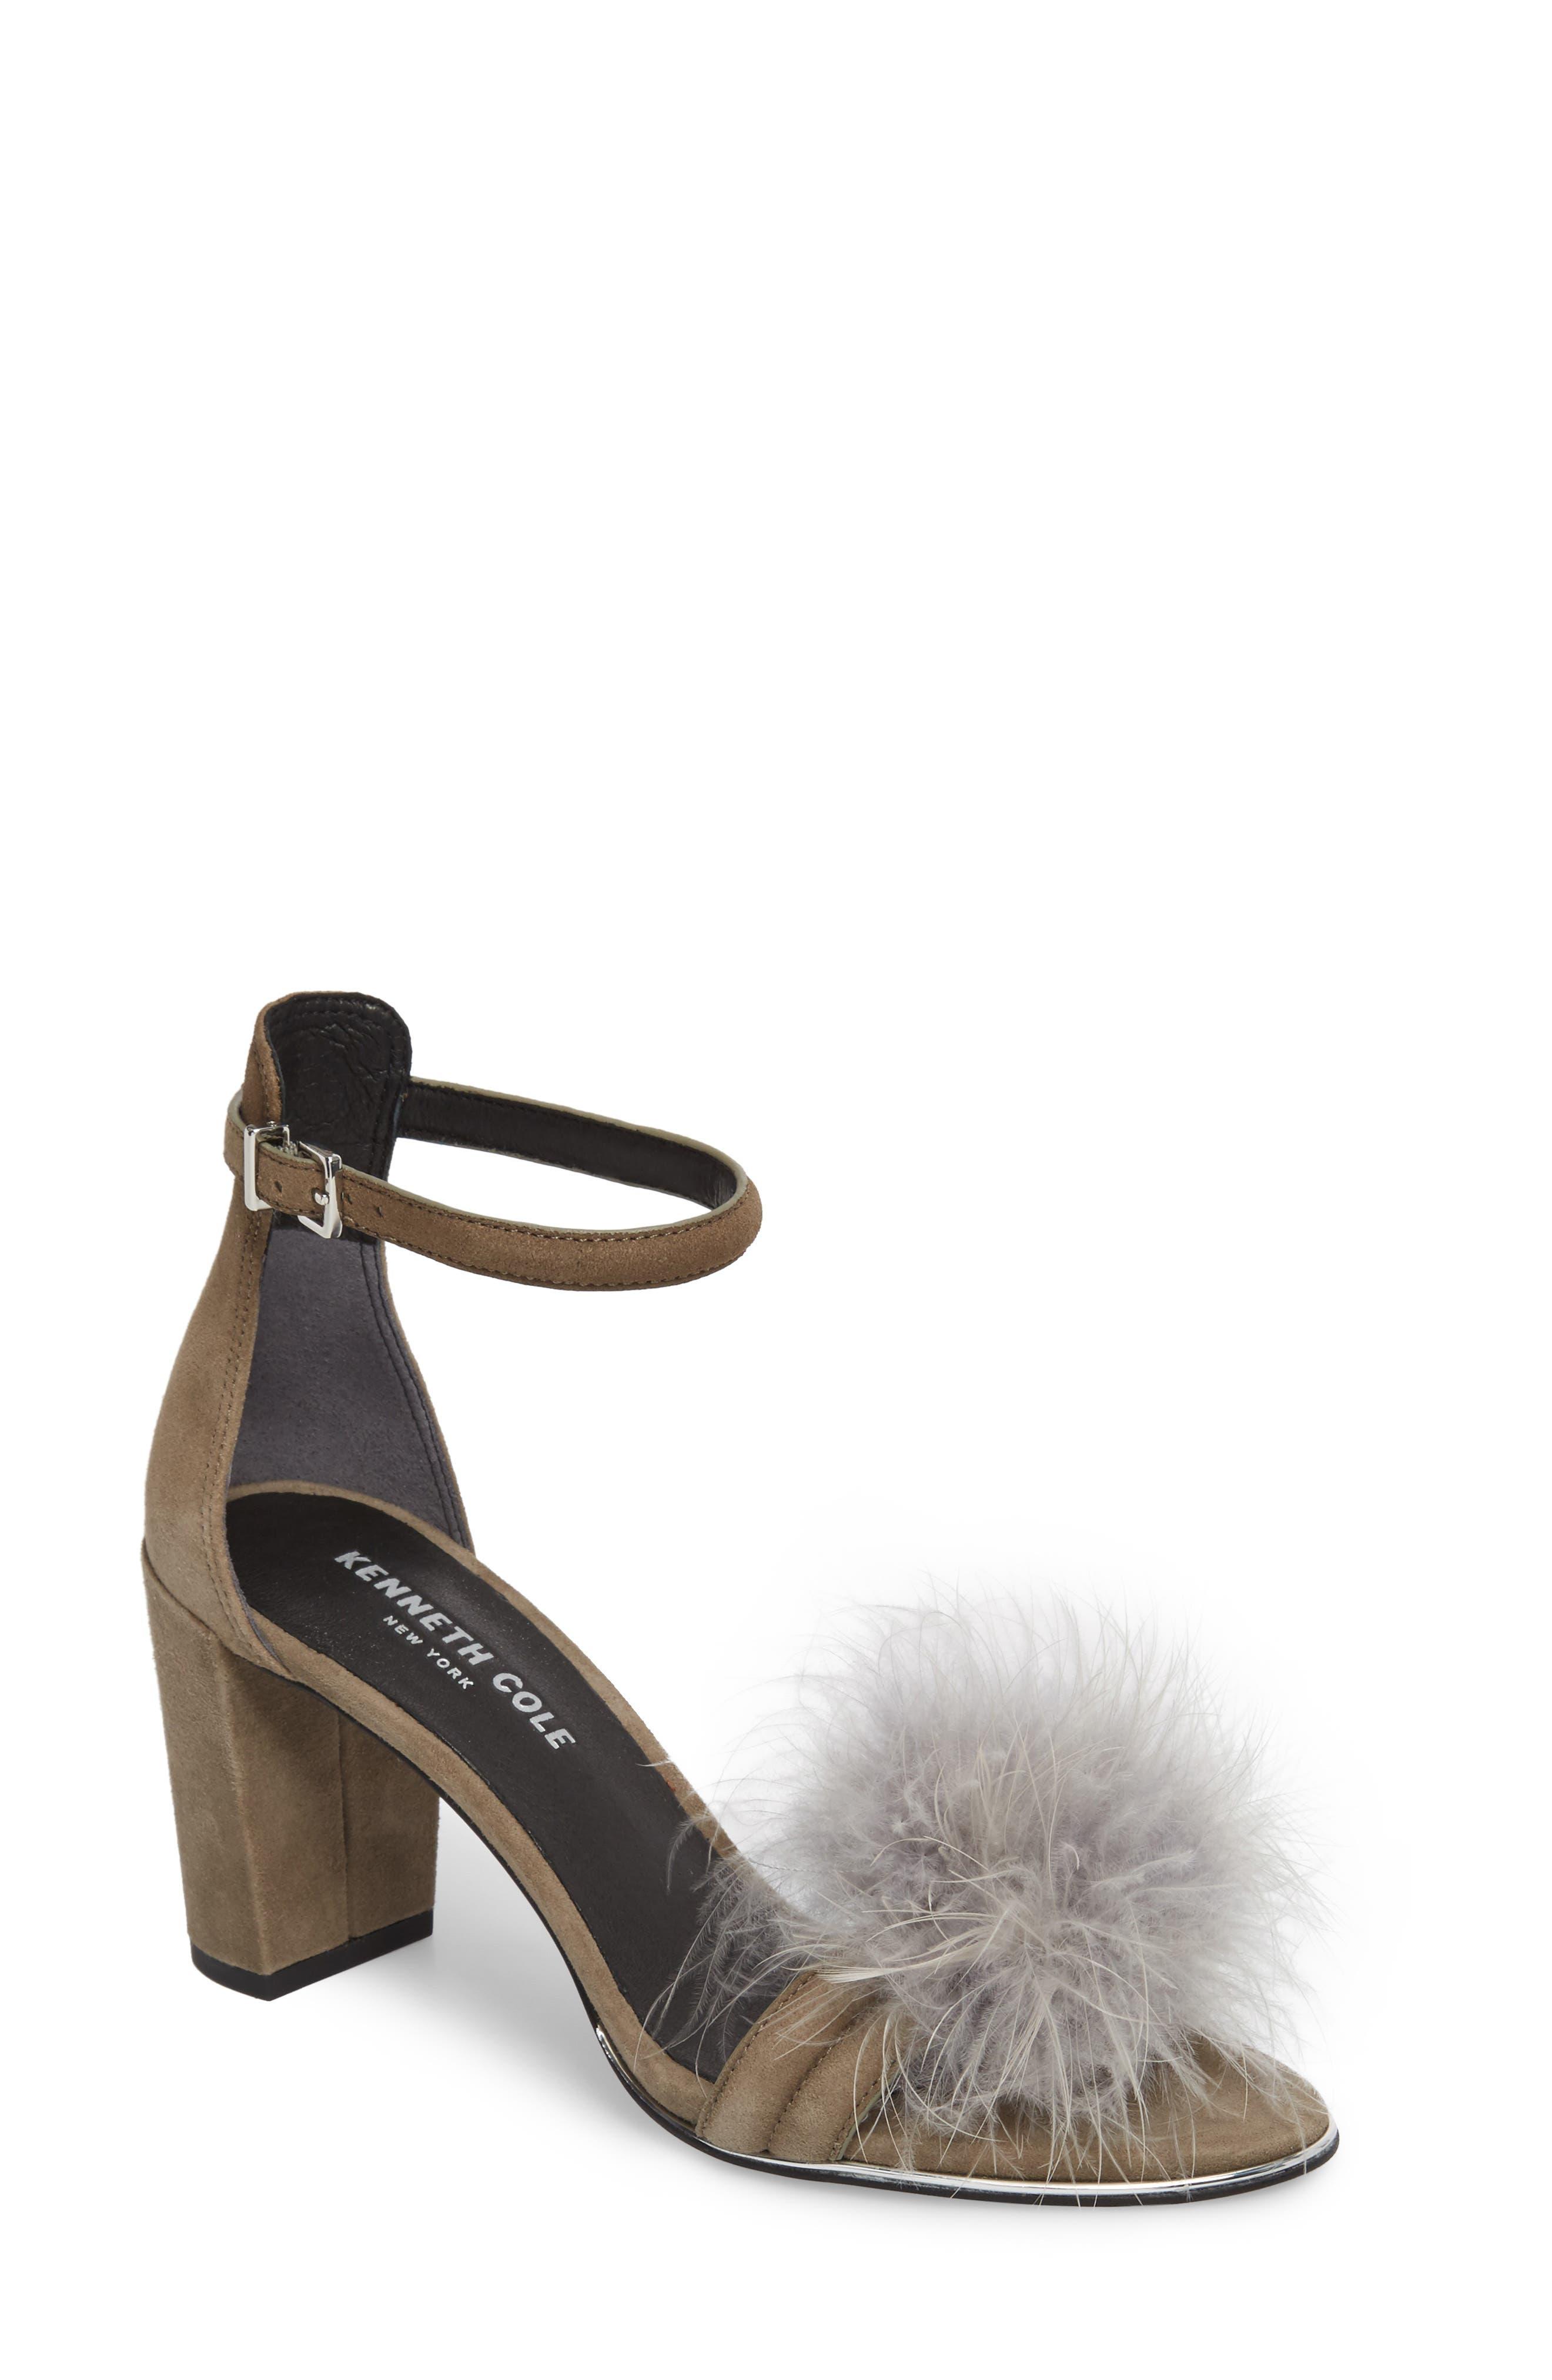 Alternate Image 1 Selected - Kenneth Cole New York Lex 3 Sandal (Women)